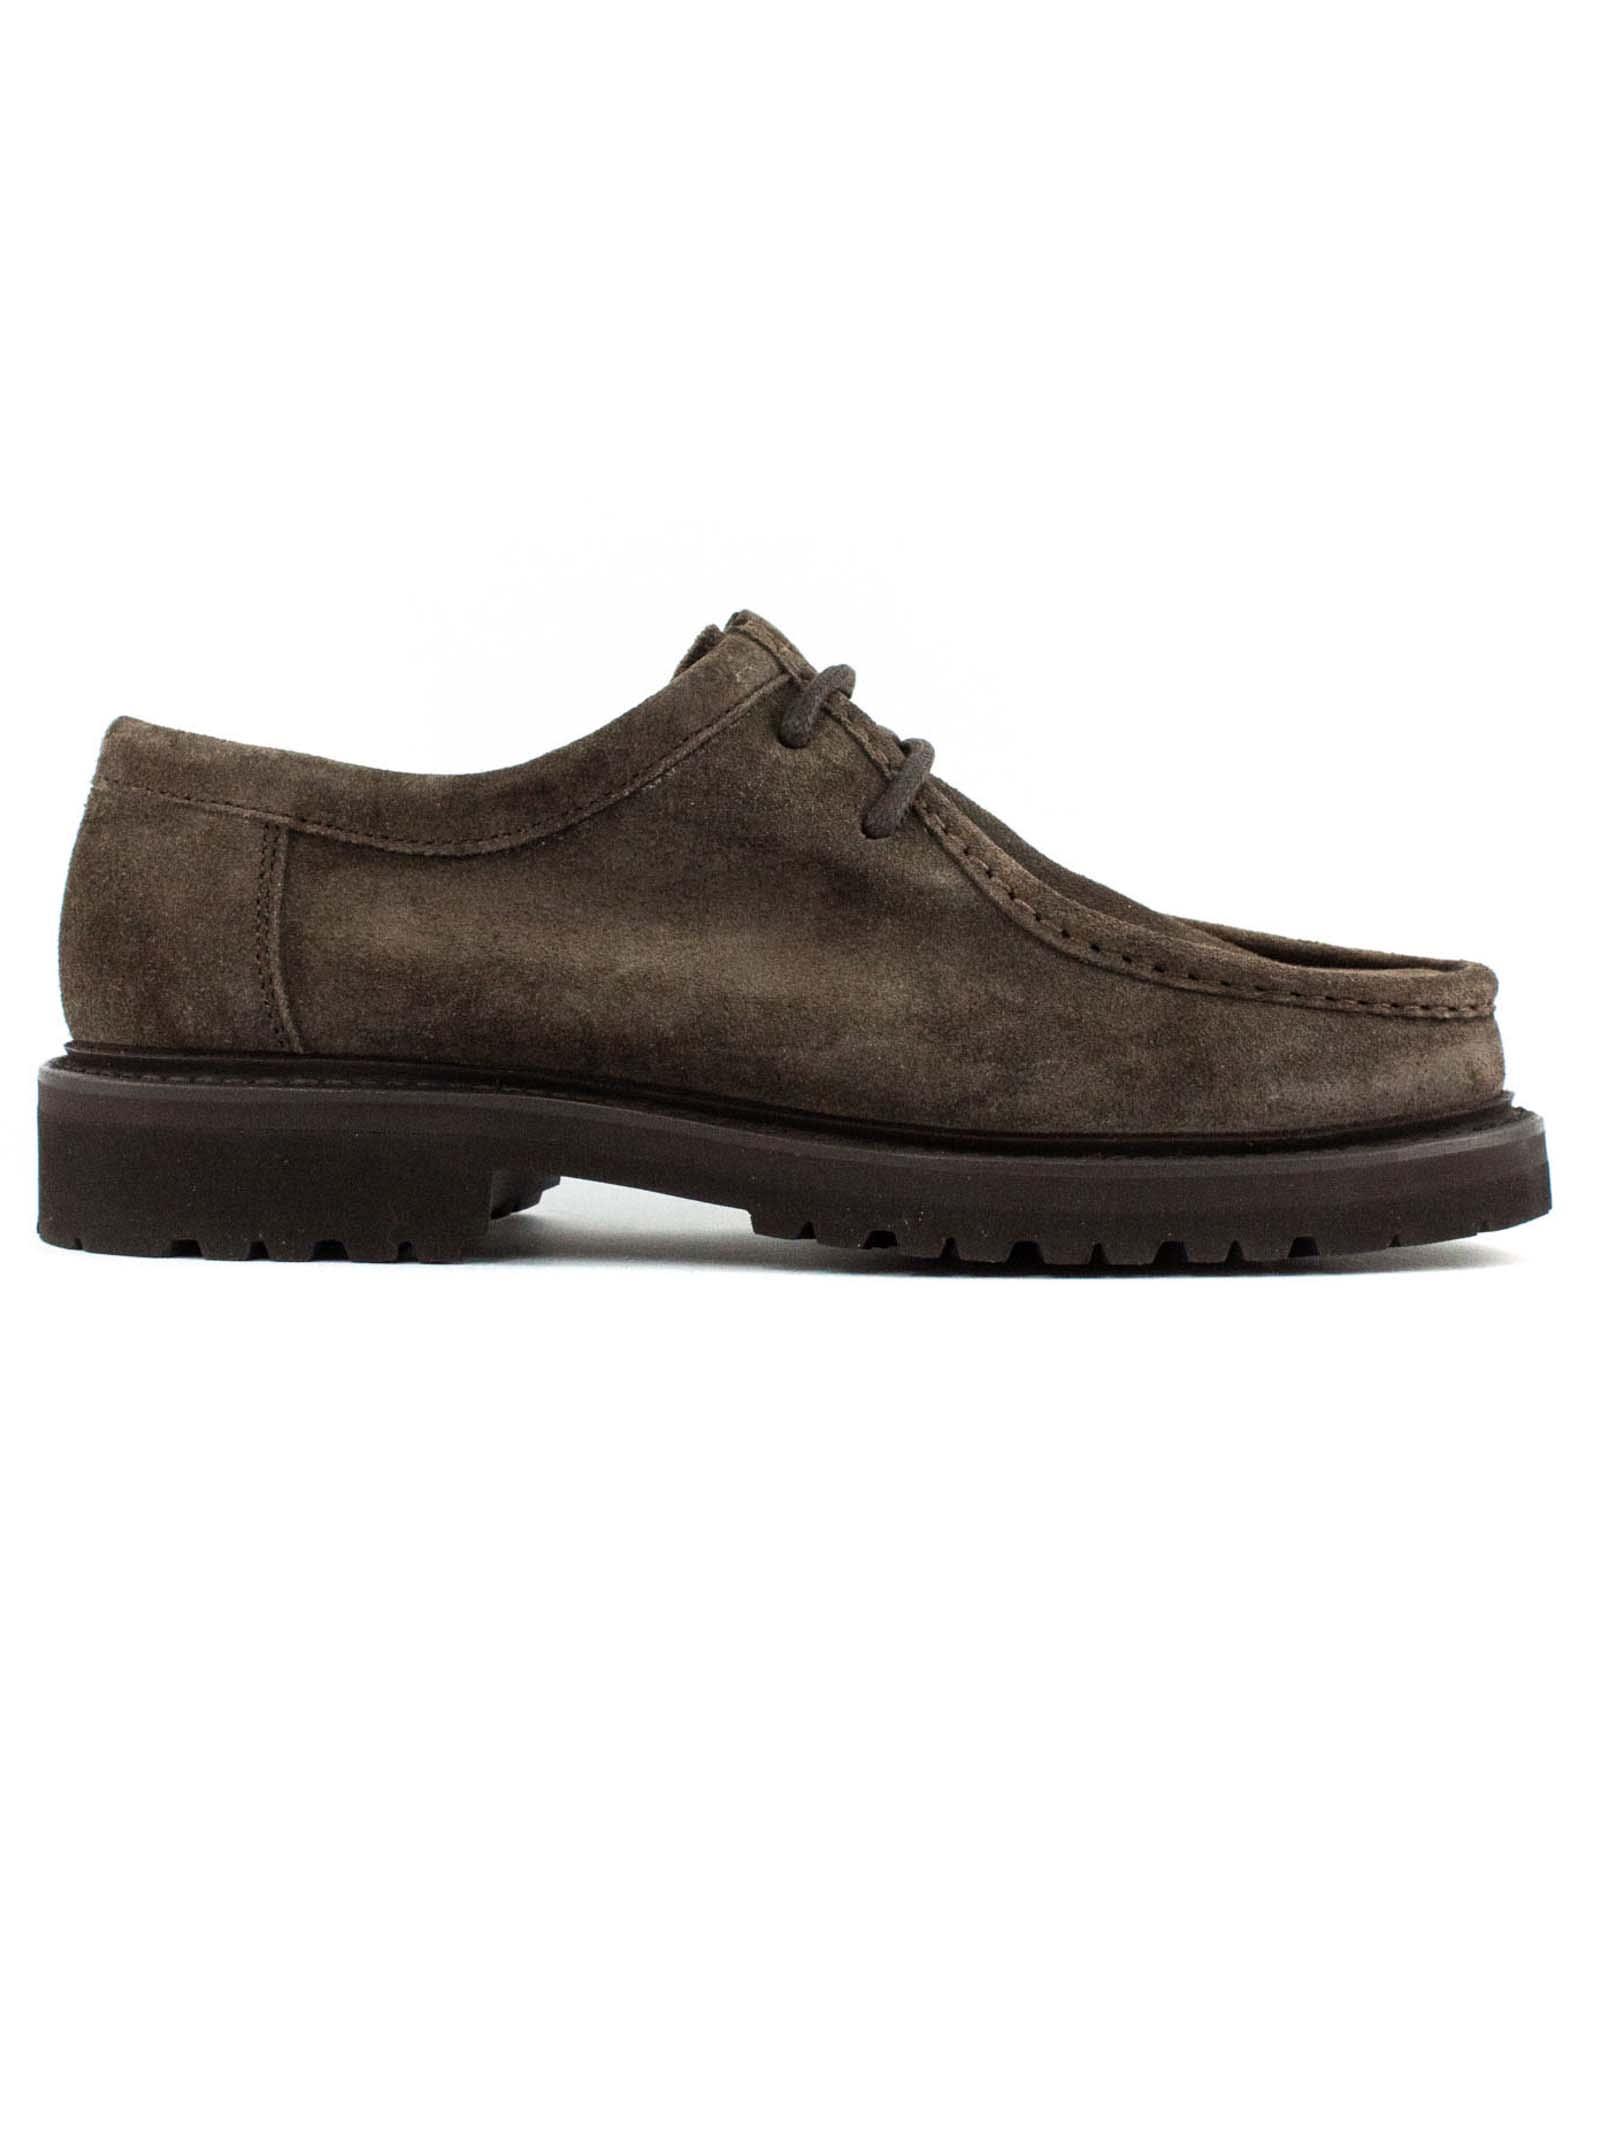 1707 Desert Boots In Brown Suede